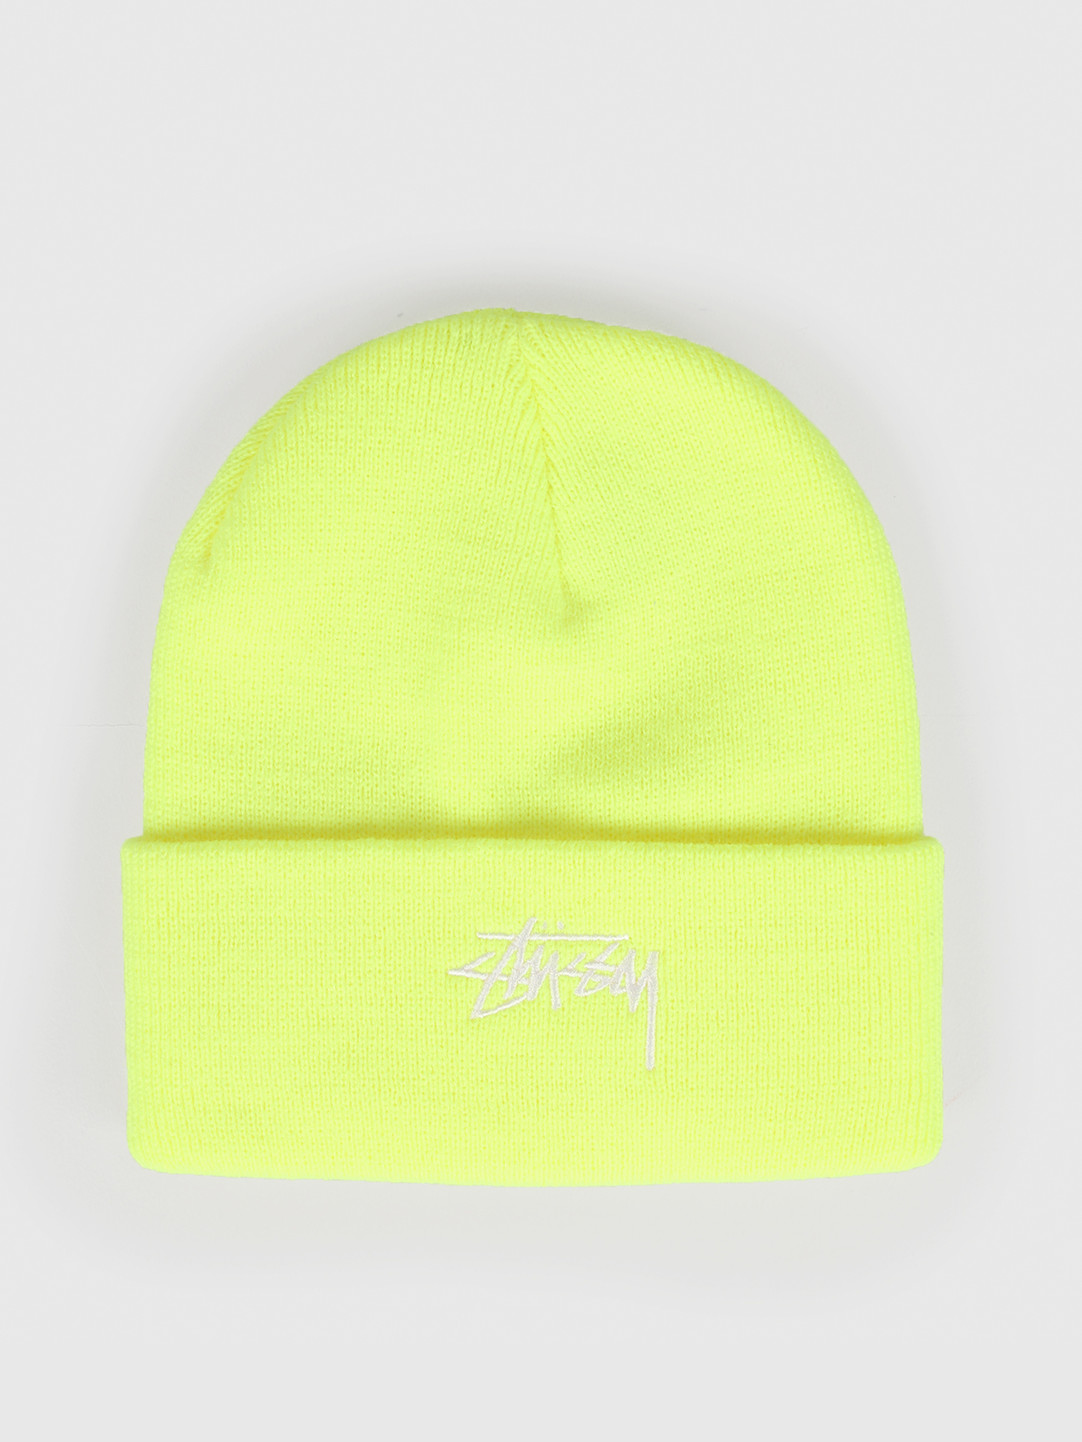 Stussy Stussy Fa19 Stock Cuff Beanie Safety Yellow 132935